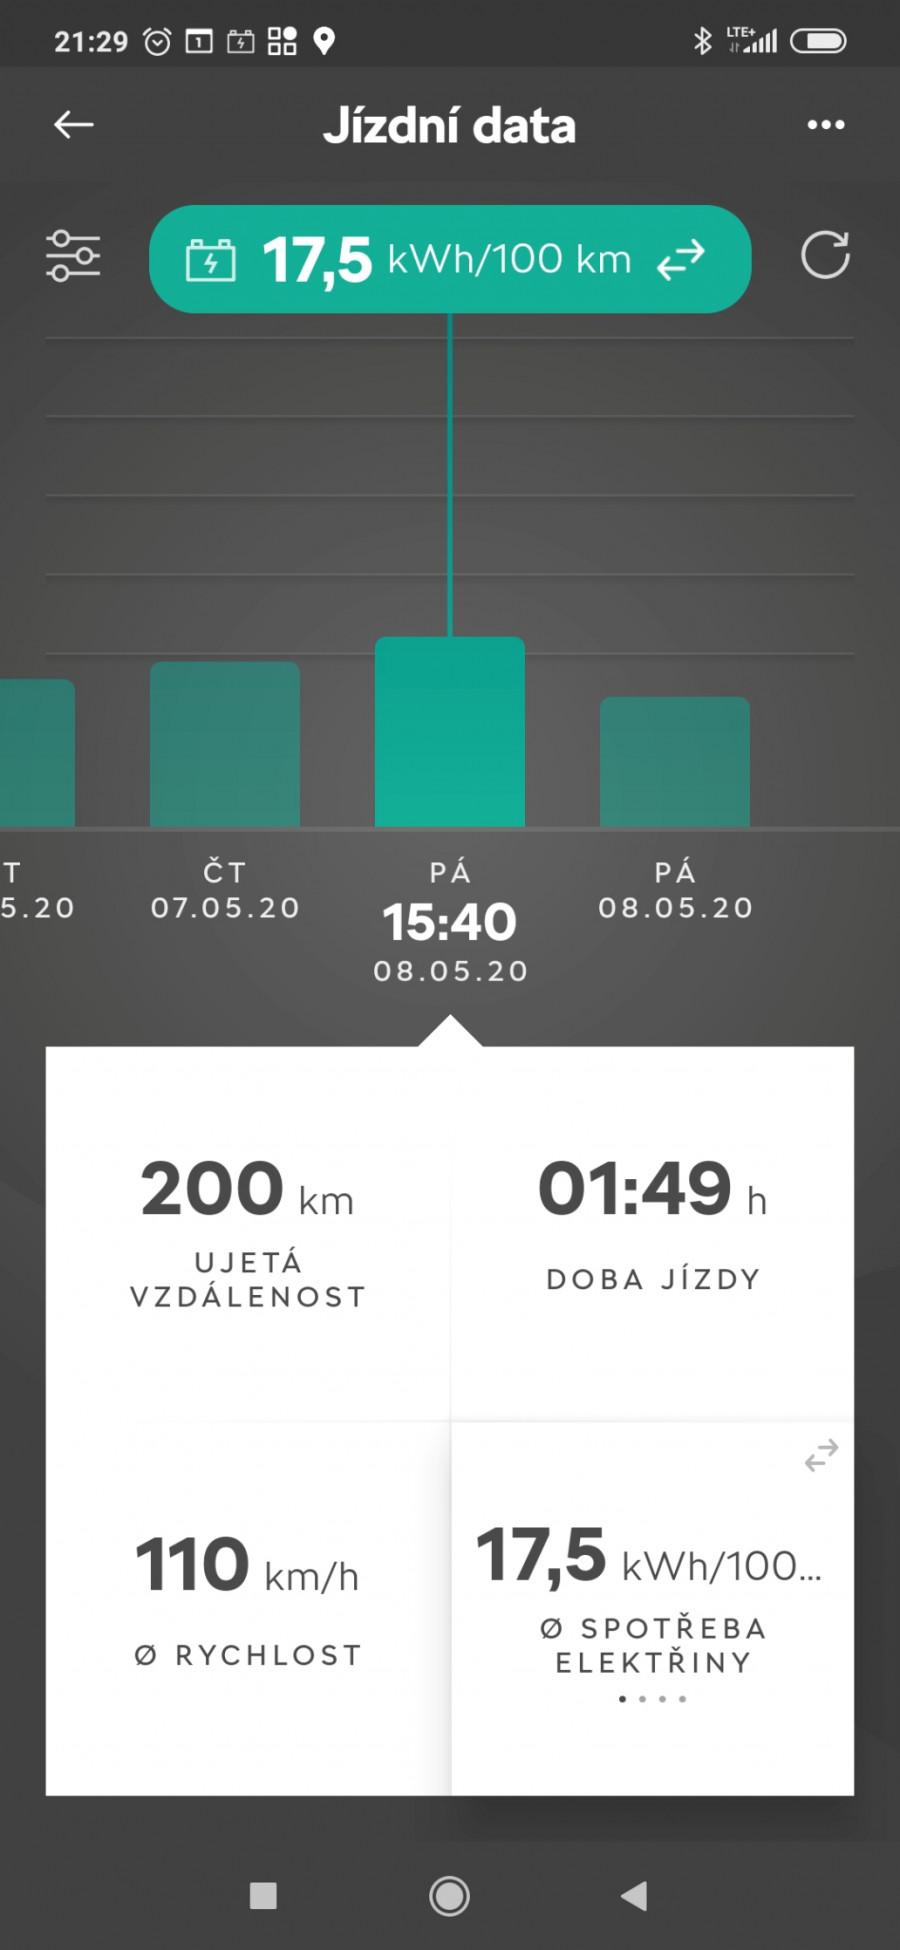 CITIGO Rychlost 110 km/h, spotřeba  17,5kWh / 100 km